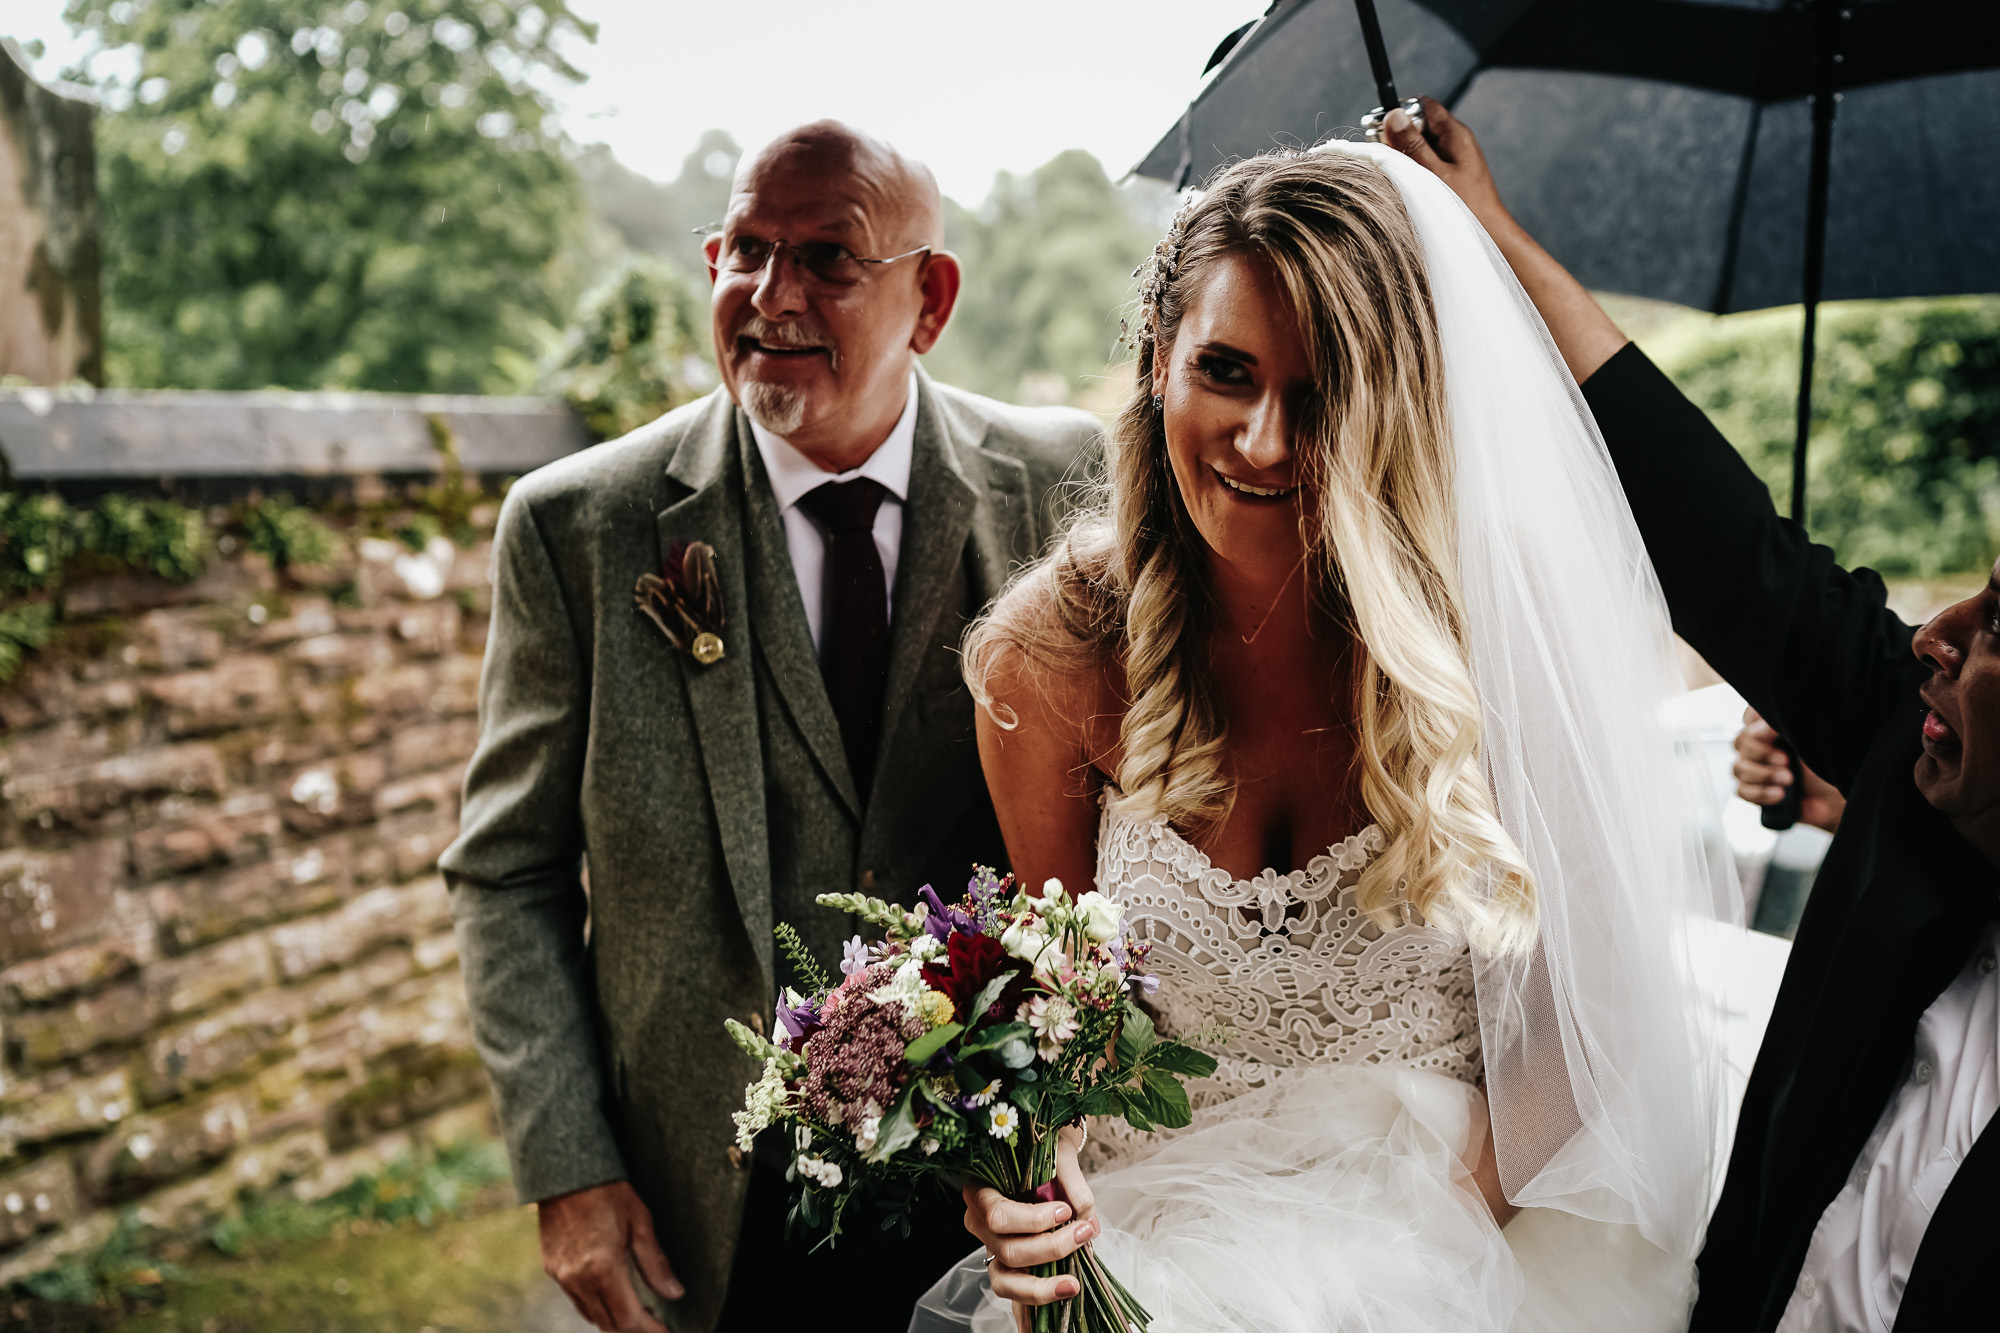 High Barn Wedding photographer lake distect penrith documentry wedding photography (21 of 57).jpg